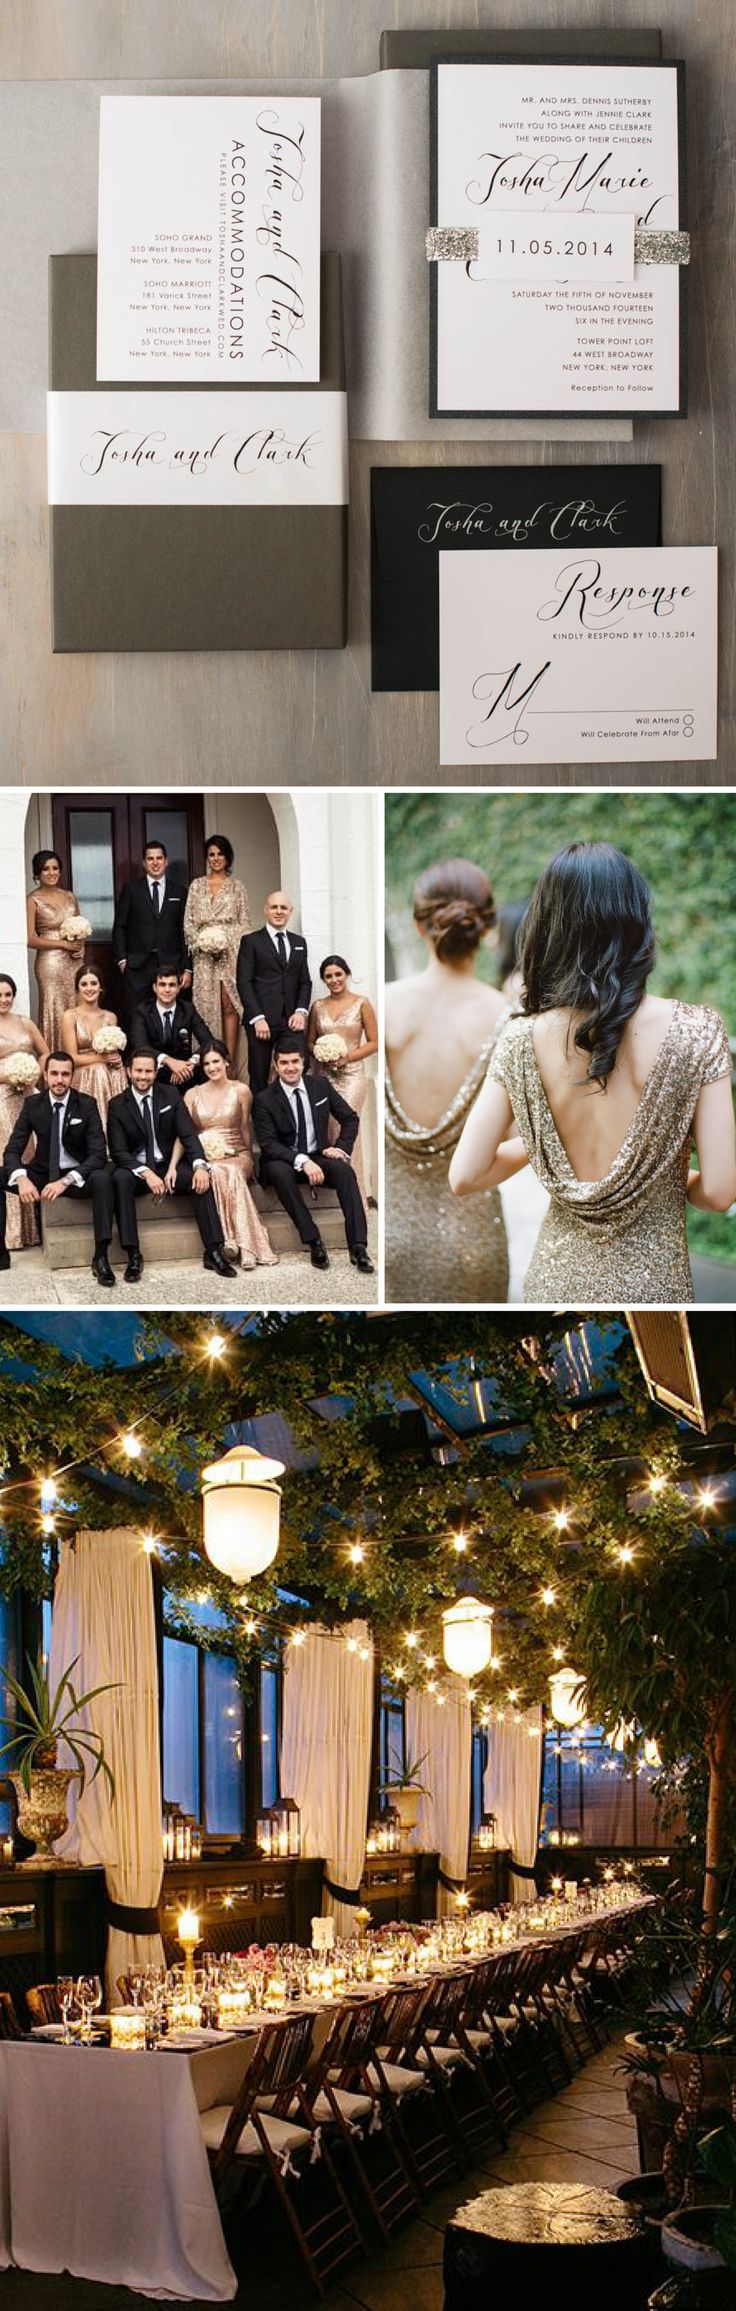 Elegant Script Boxed Wedding Invitations Inspiration By Beacon Lane